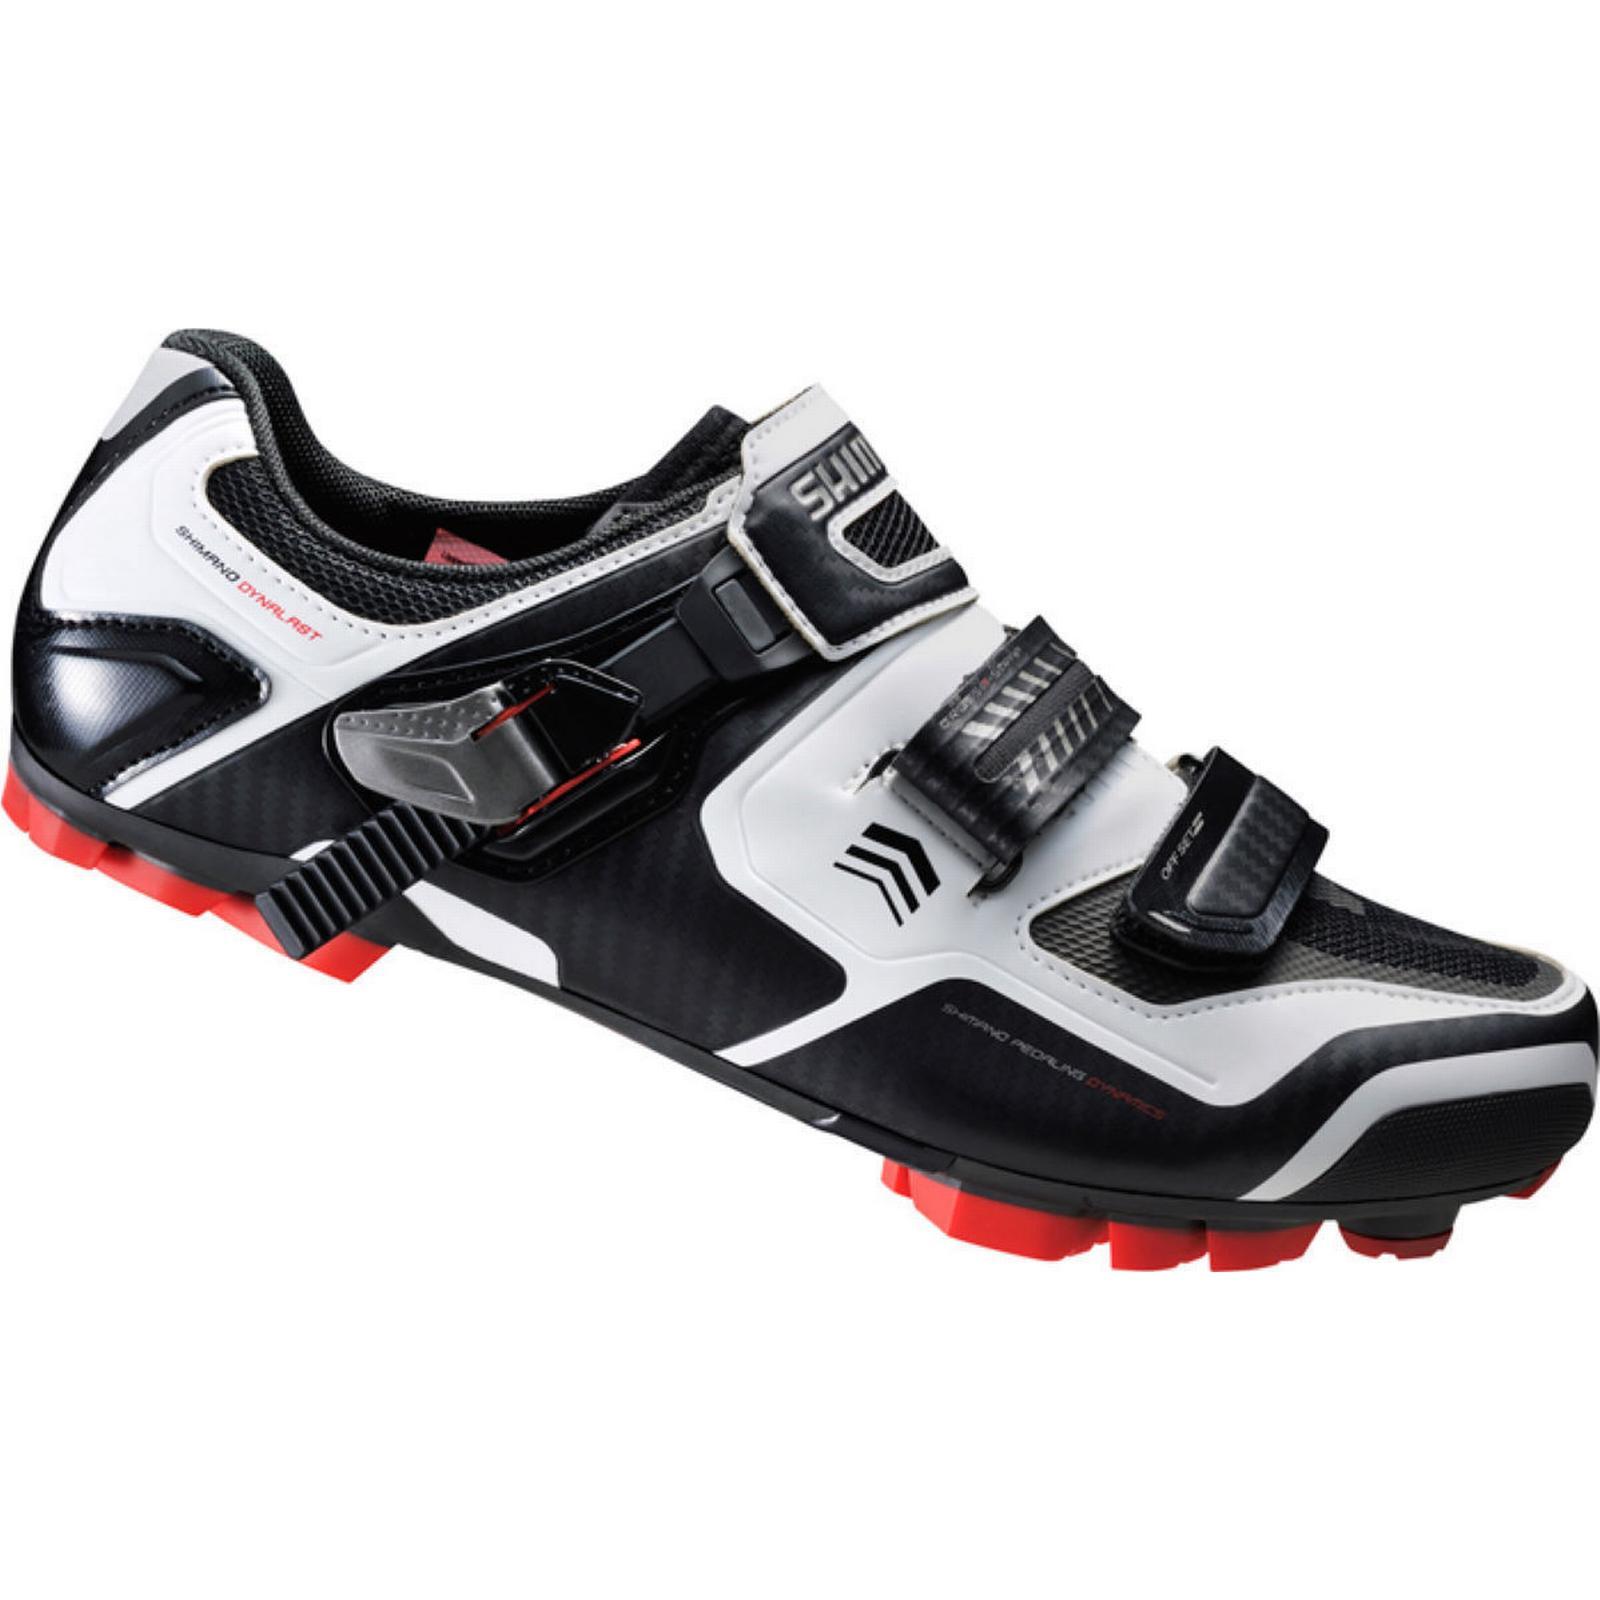 Wiggle Mountain Online Cycle Shop Shimano XC61 SPD Mountain Wiggle Bike Shoes Cycling Shoes 6c0986